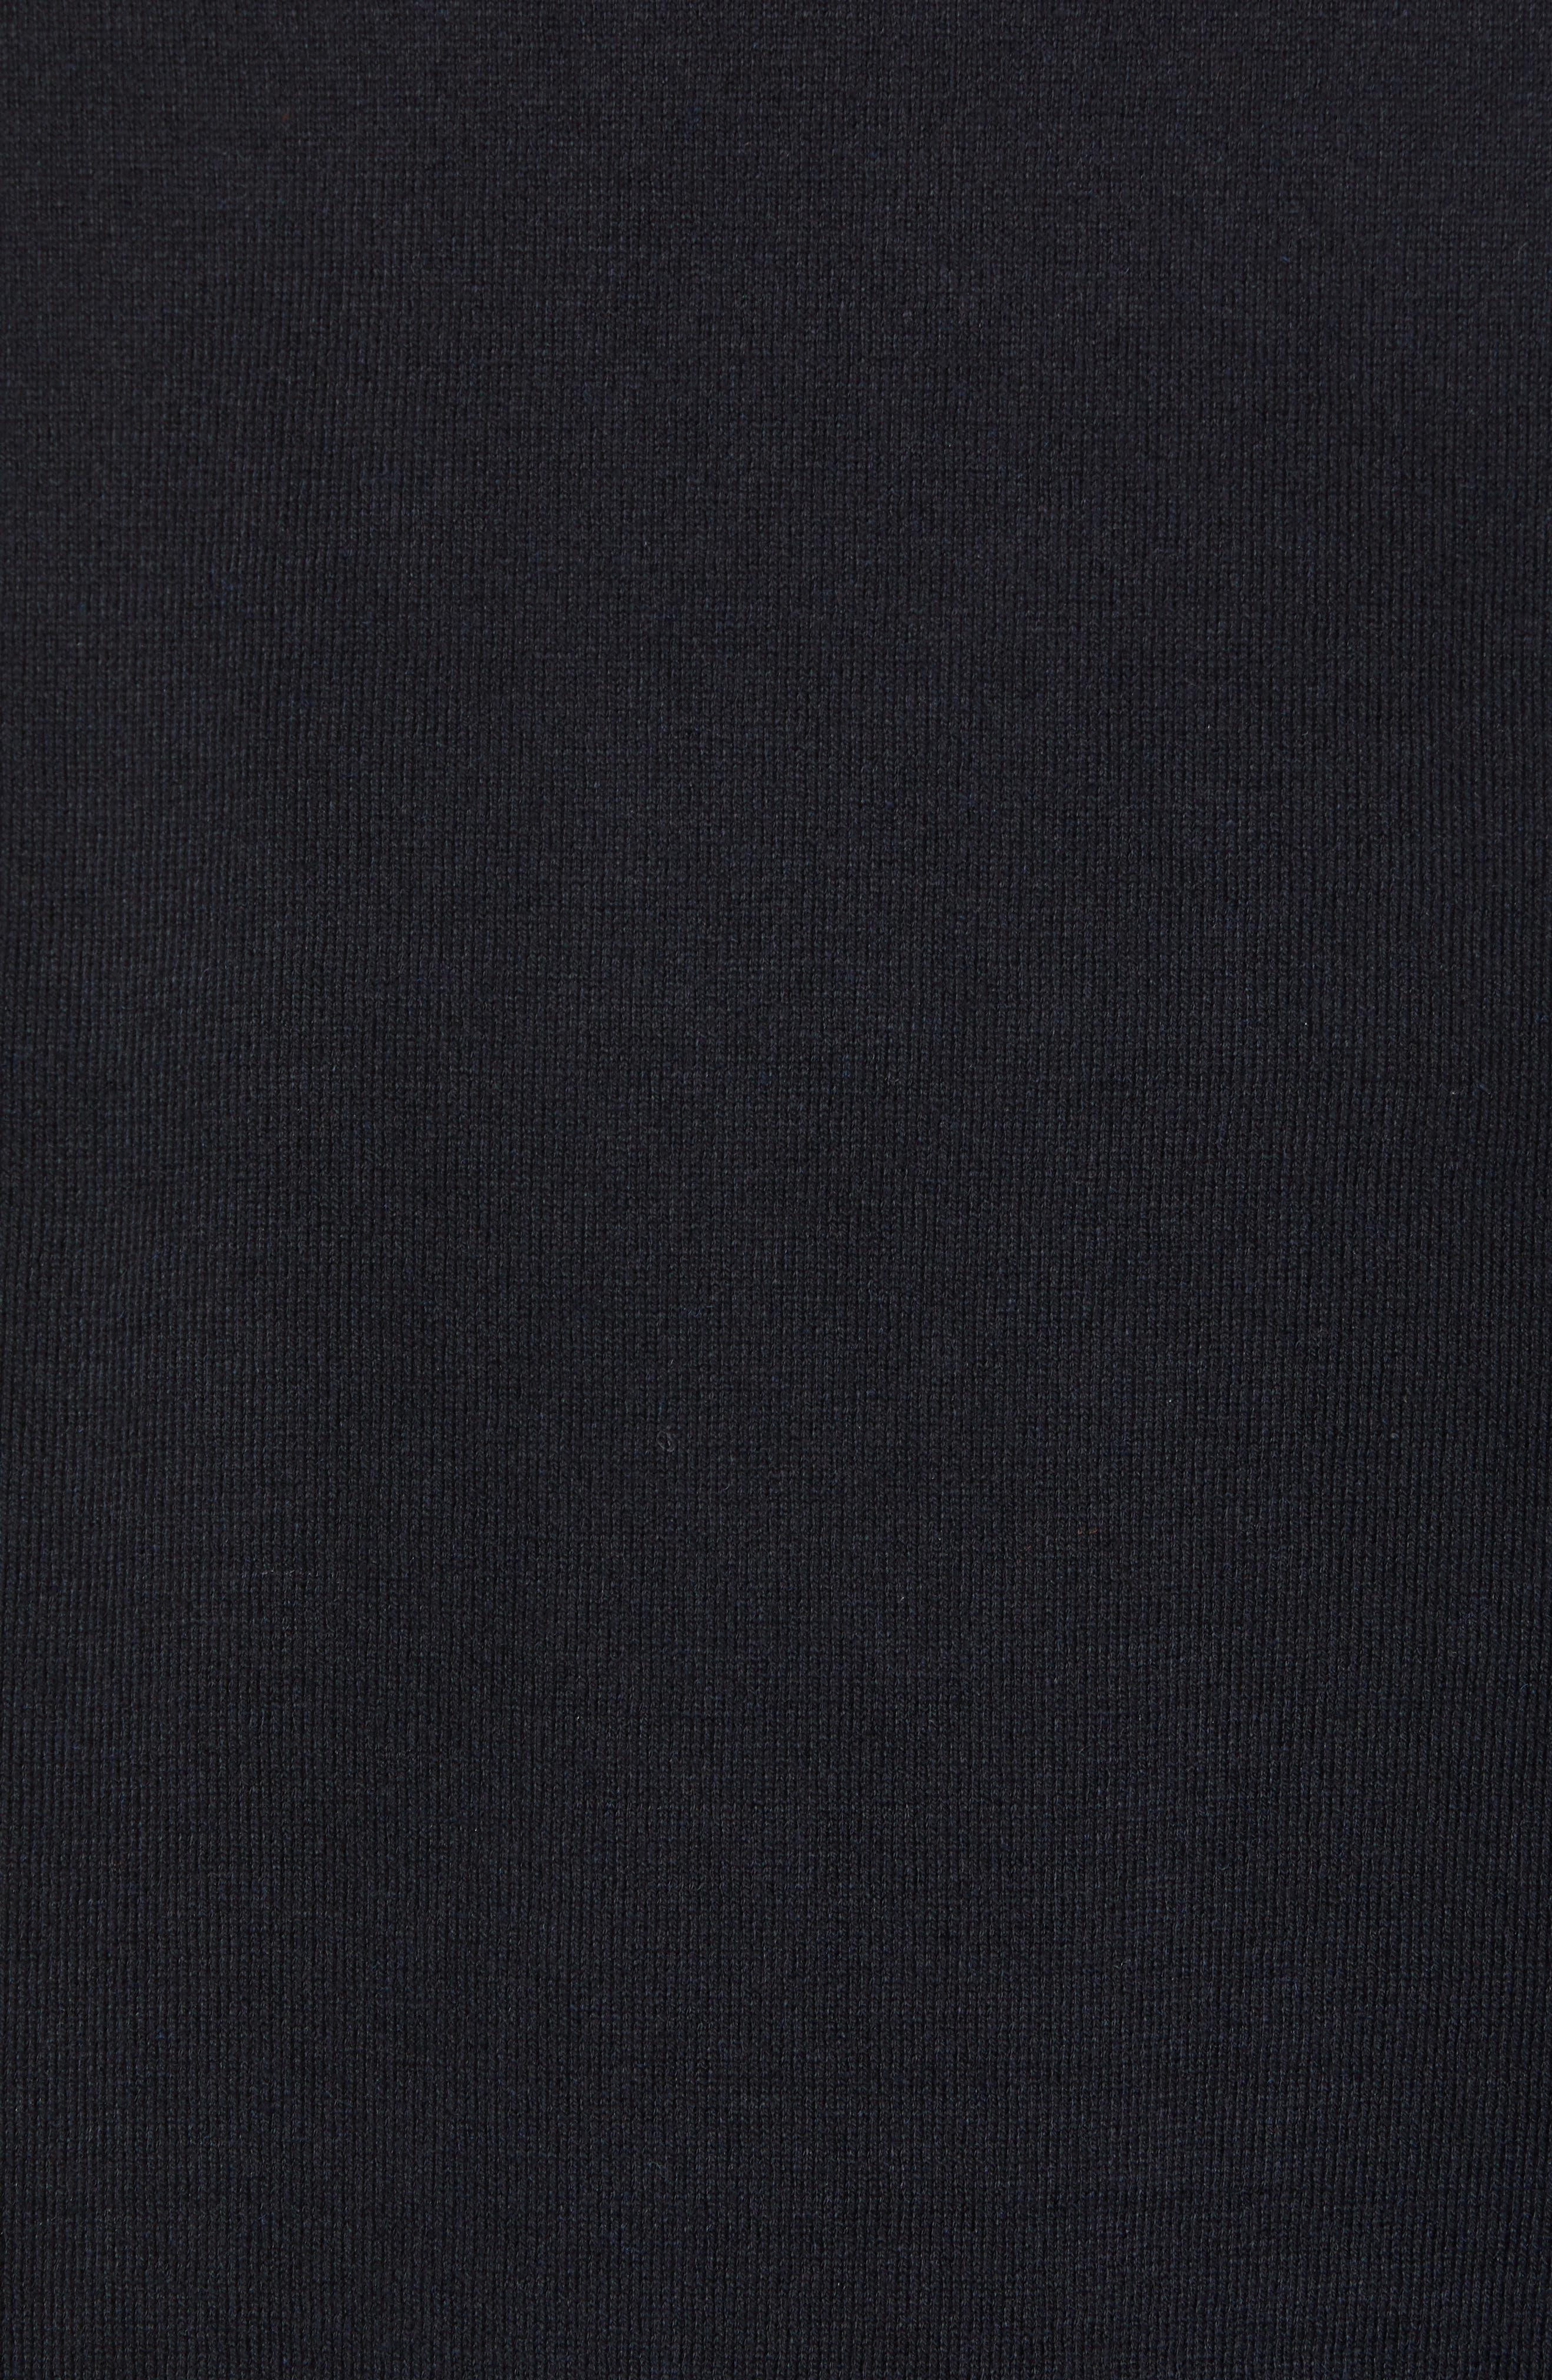 Crewneck Sweatshirt,                             Alternate thumbnail 5, color,                             BLACK